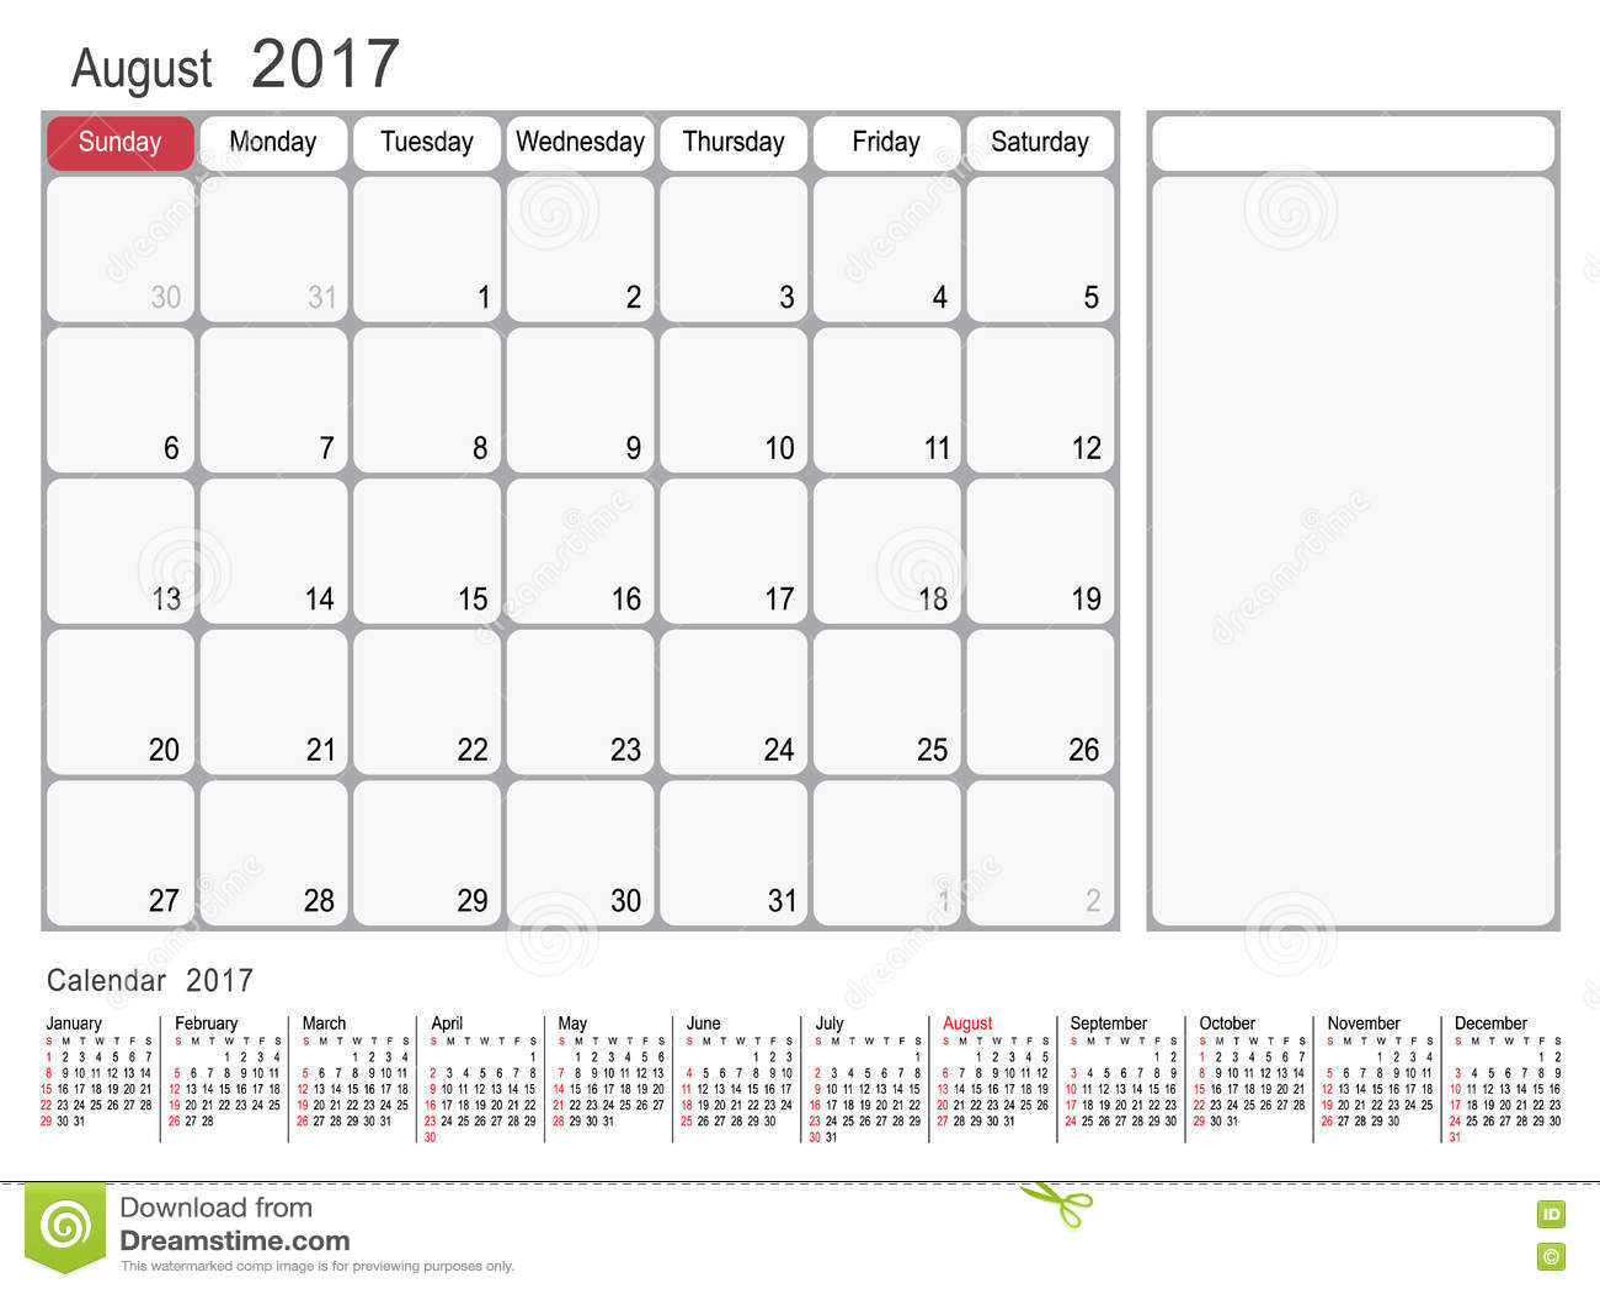 Calendar Planner August 2017 Stock Vector - Image: 82242039